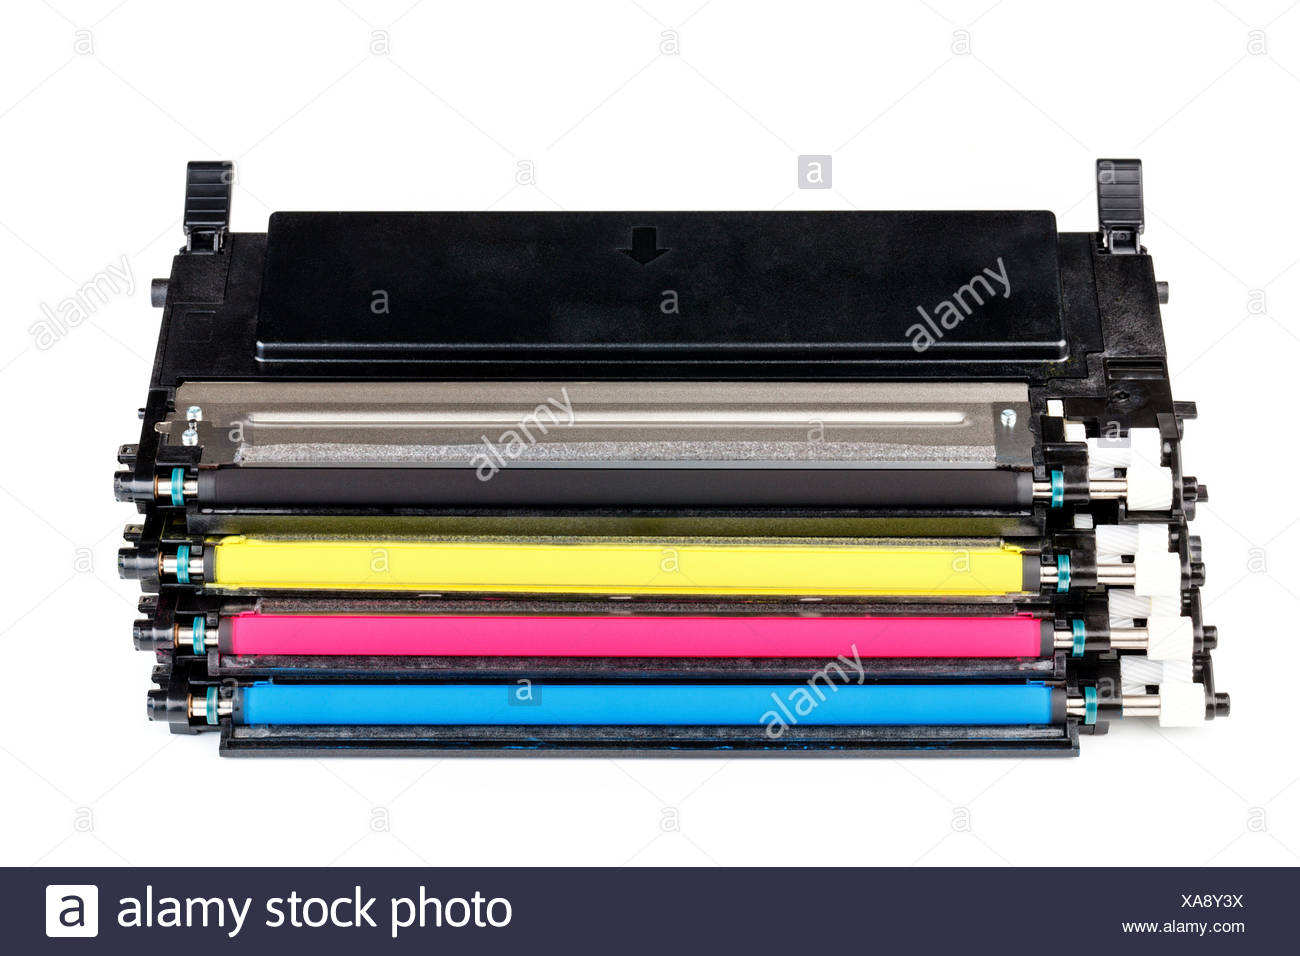 Colour printer cartridge - Stock Image